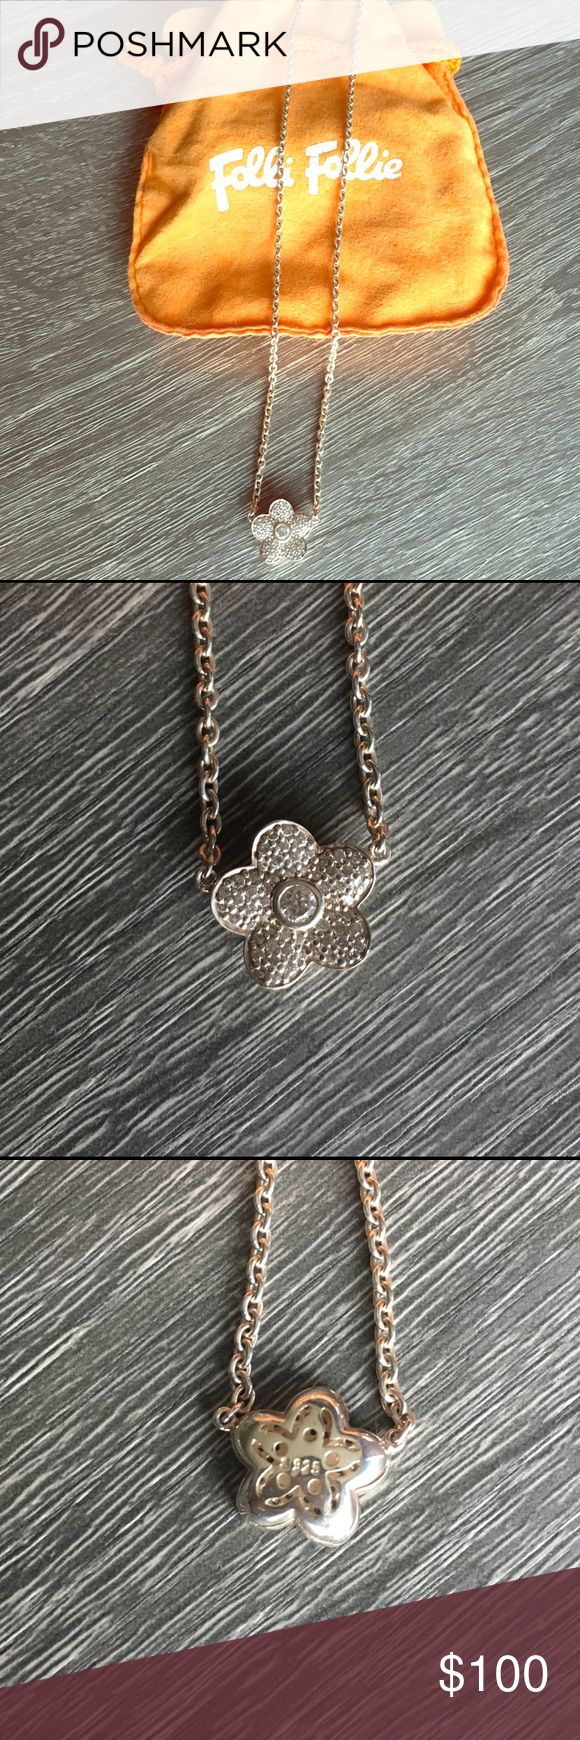 "Folli Follie Follie di Fiori Necklace Authentic Folli Follie 925 silver (sterling silver) necklace with fixed follie. 16"" adjustable necklace. Comes with dust bag. No trades. Folli Follie Jewelry Necklaces"